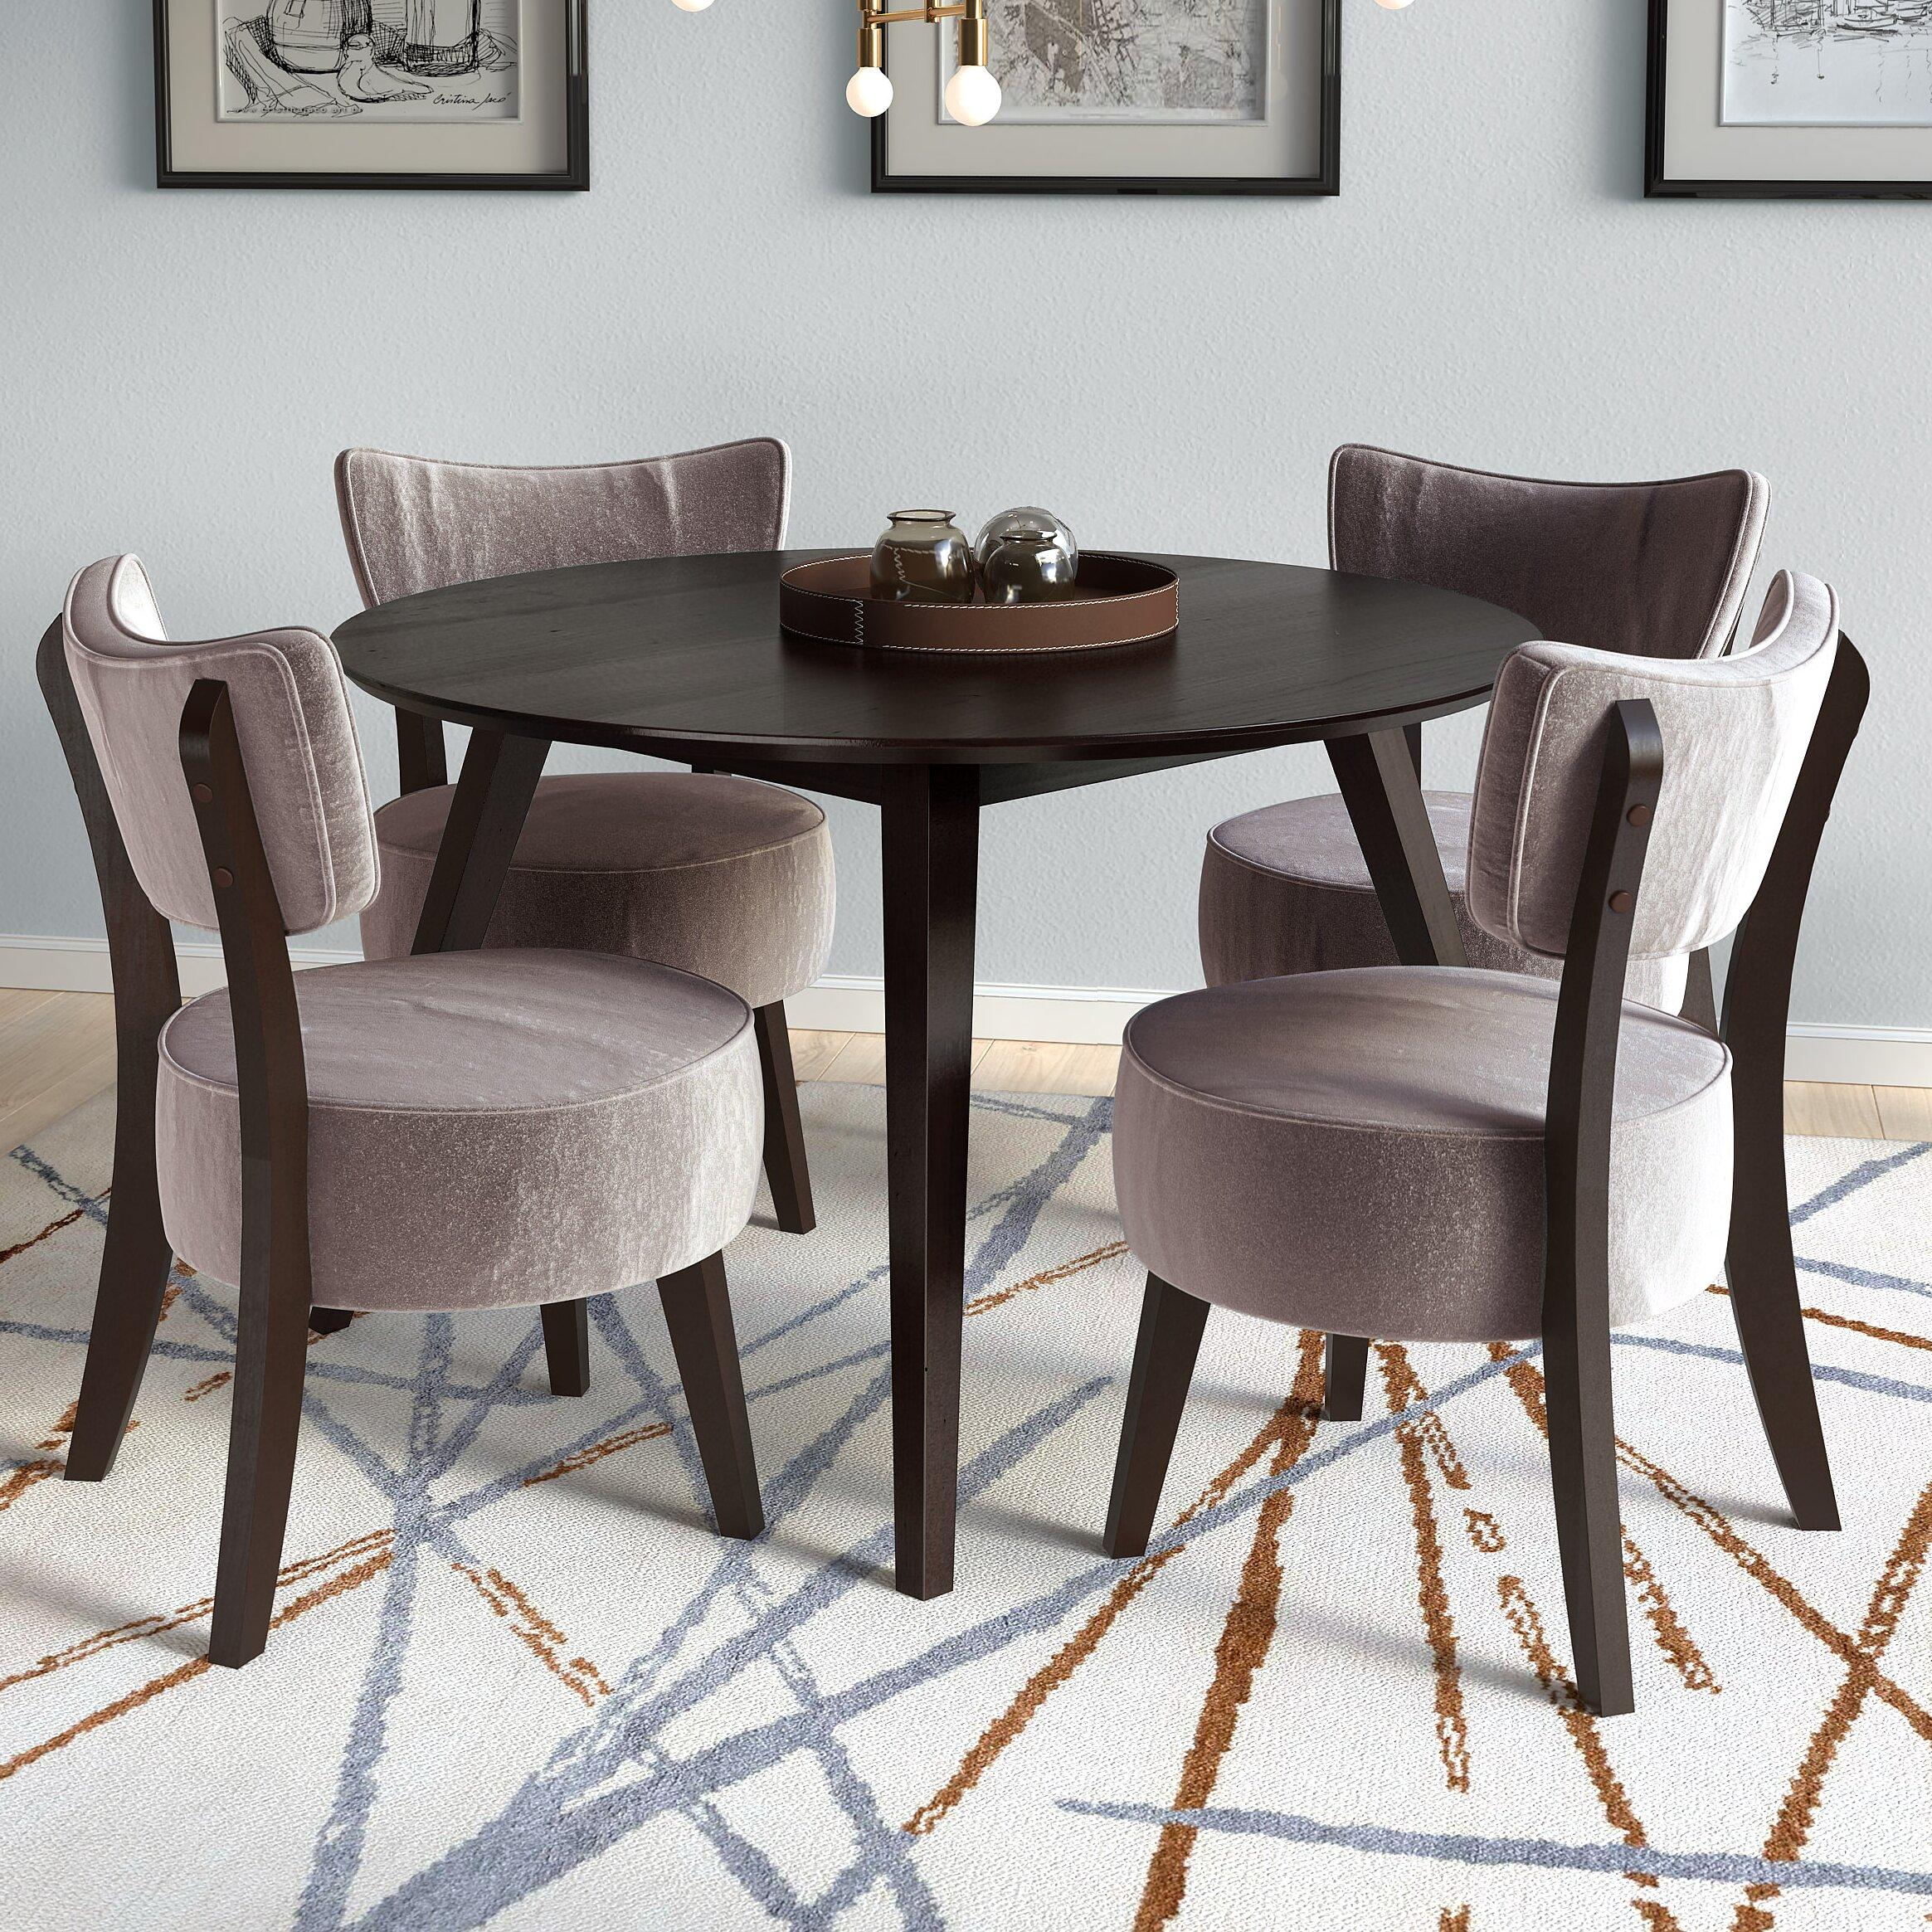 Brayden Studio Mcwhorter Dining Table Reviews: Brayden Studio Gusman Round Stained Dining Table & Reviews